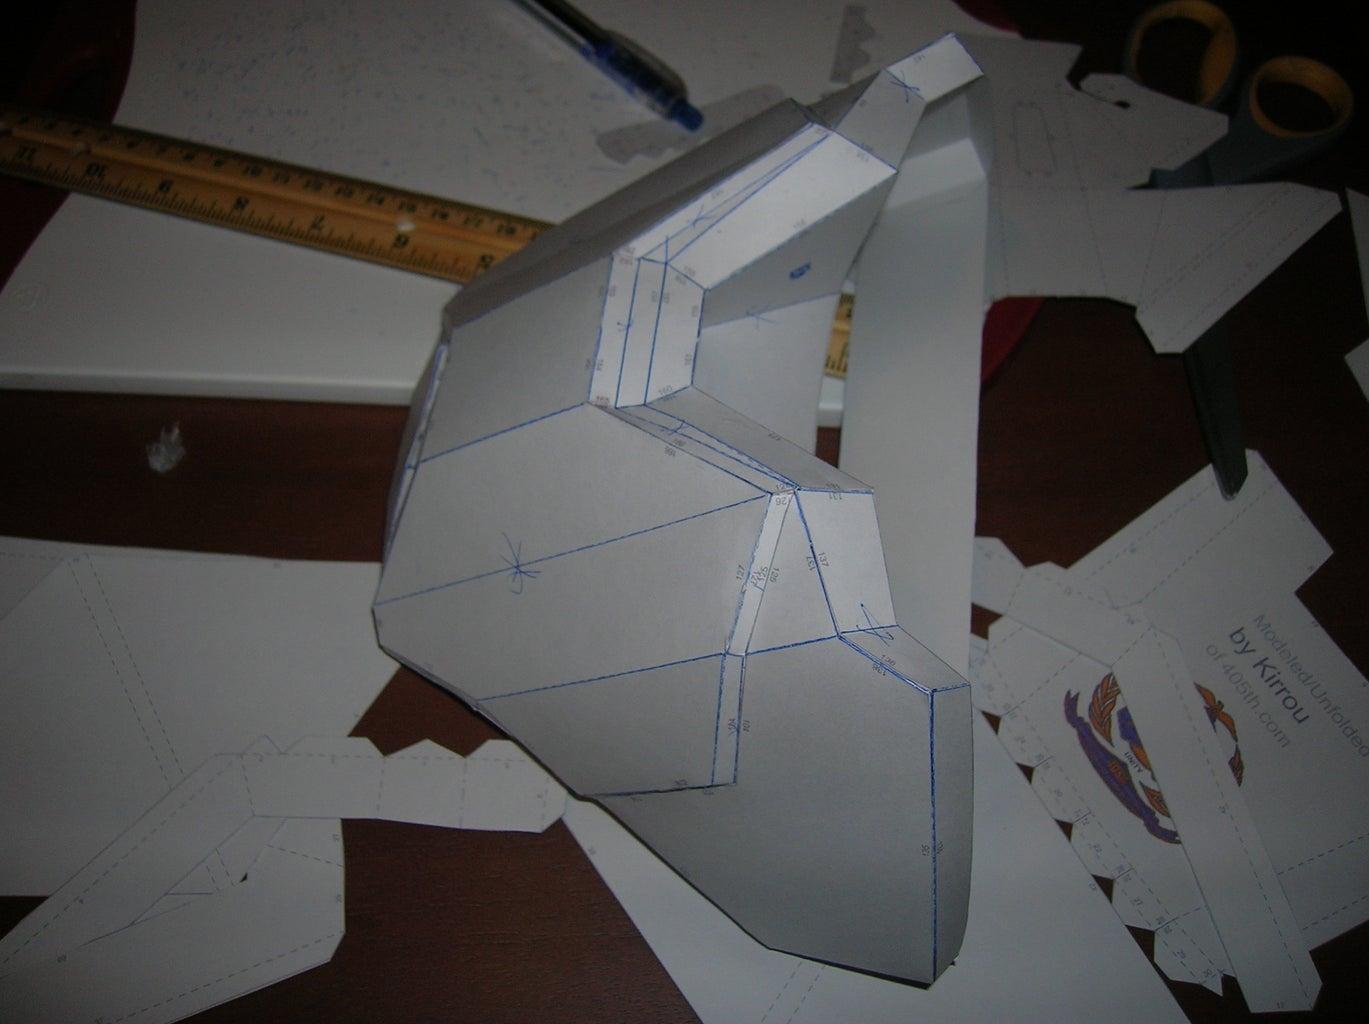 Part 3: Arms